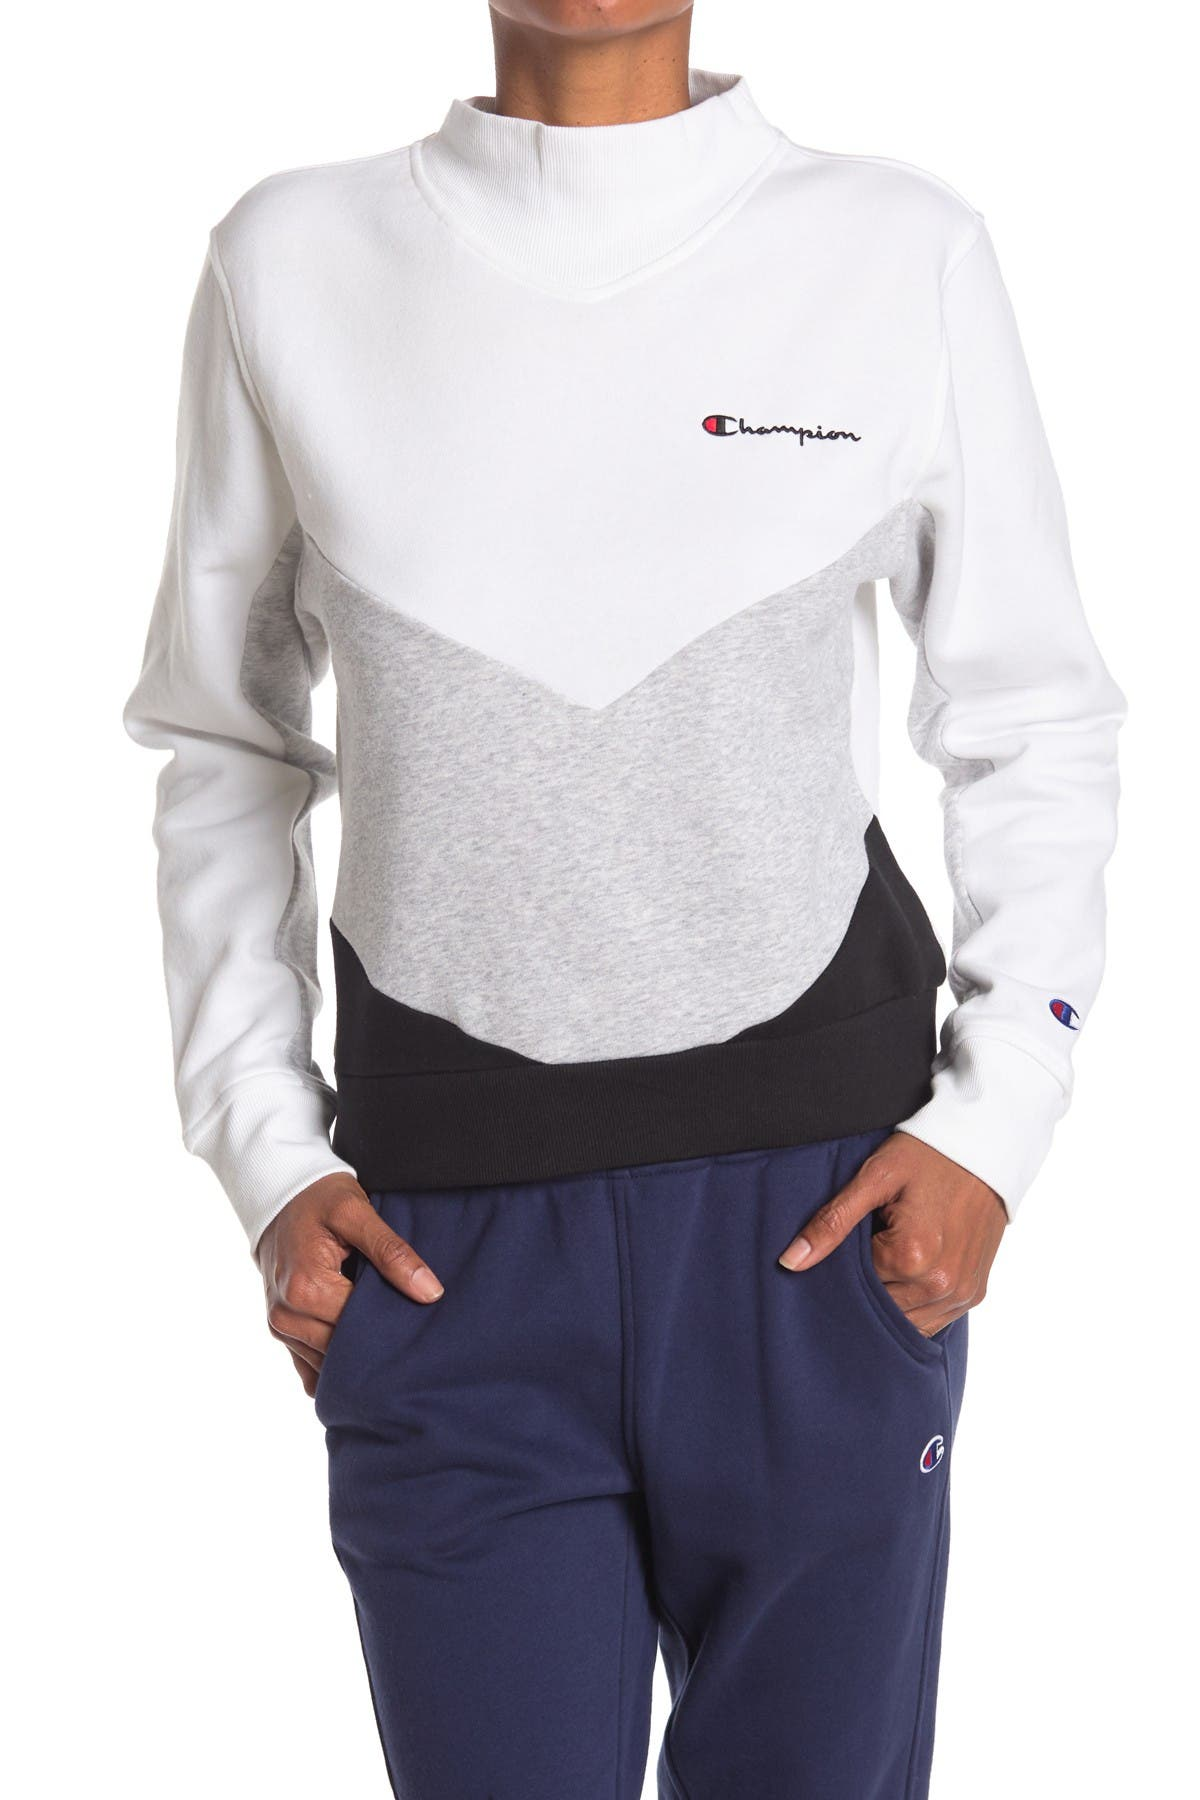 Image of Champion Campus Chevron Stripe Mock Neck Pullover